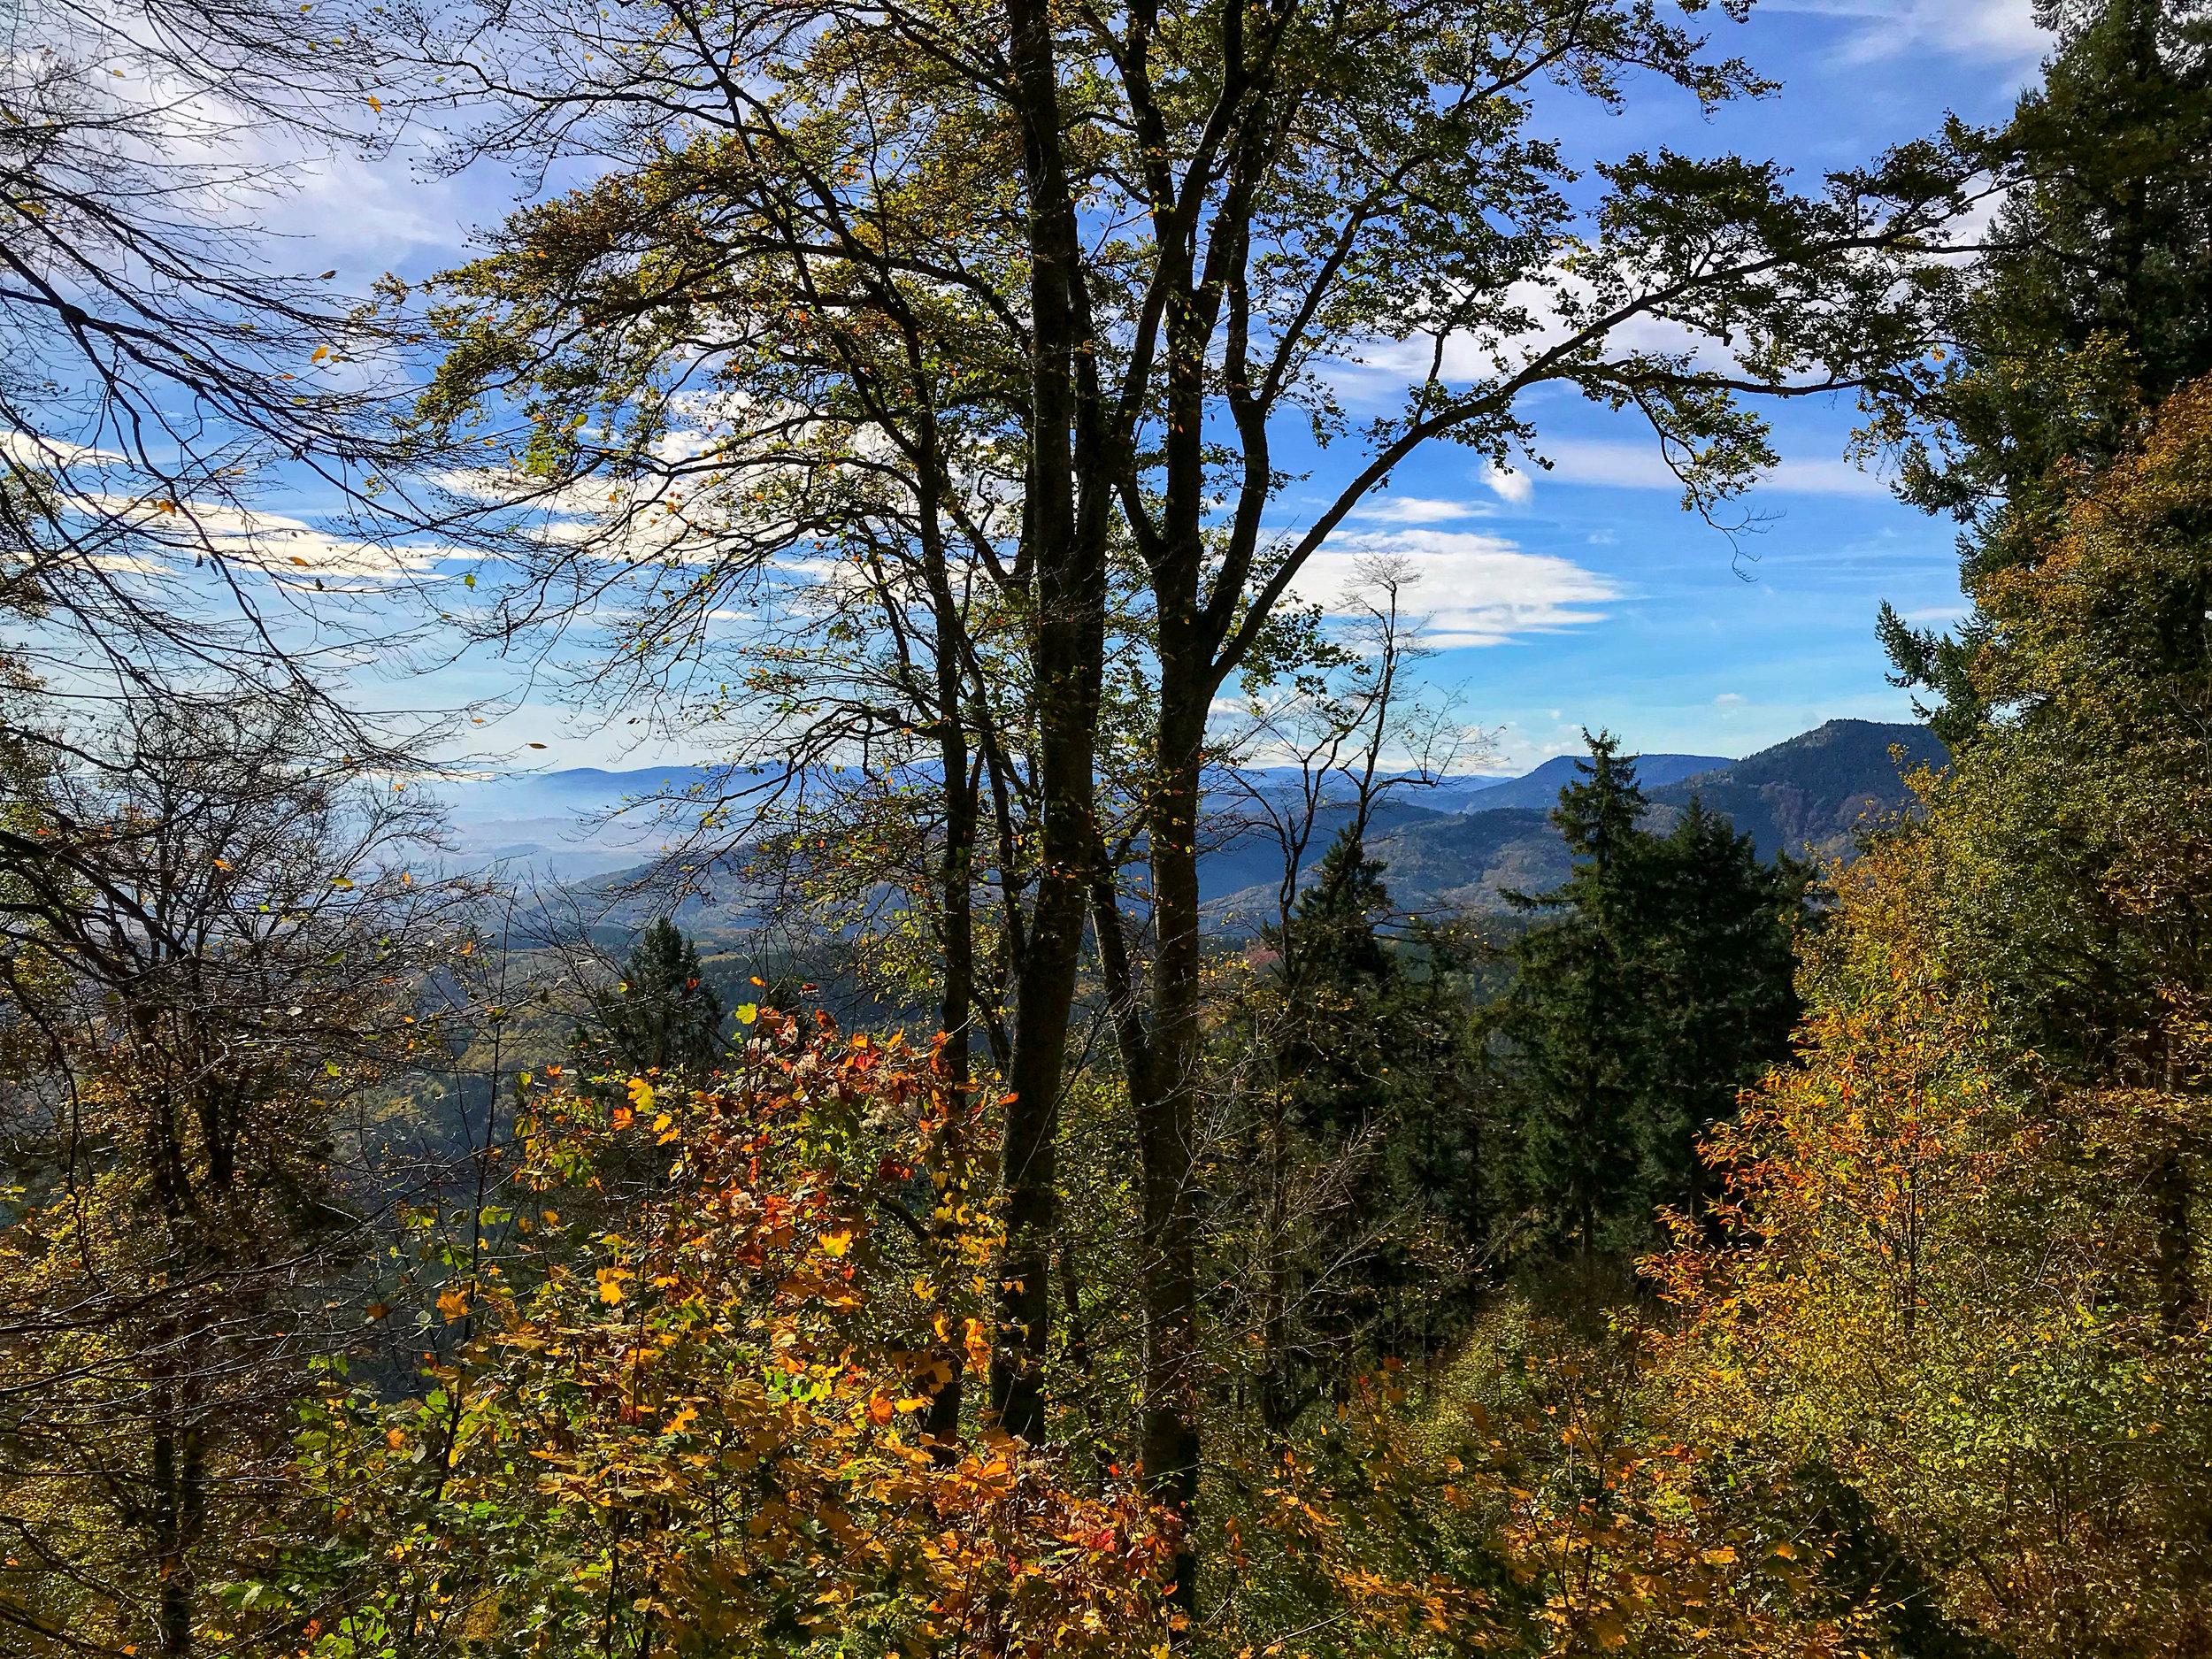 Autumn colour of the Vosges mountains